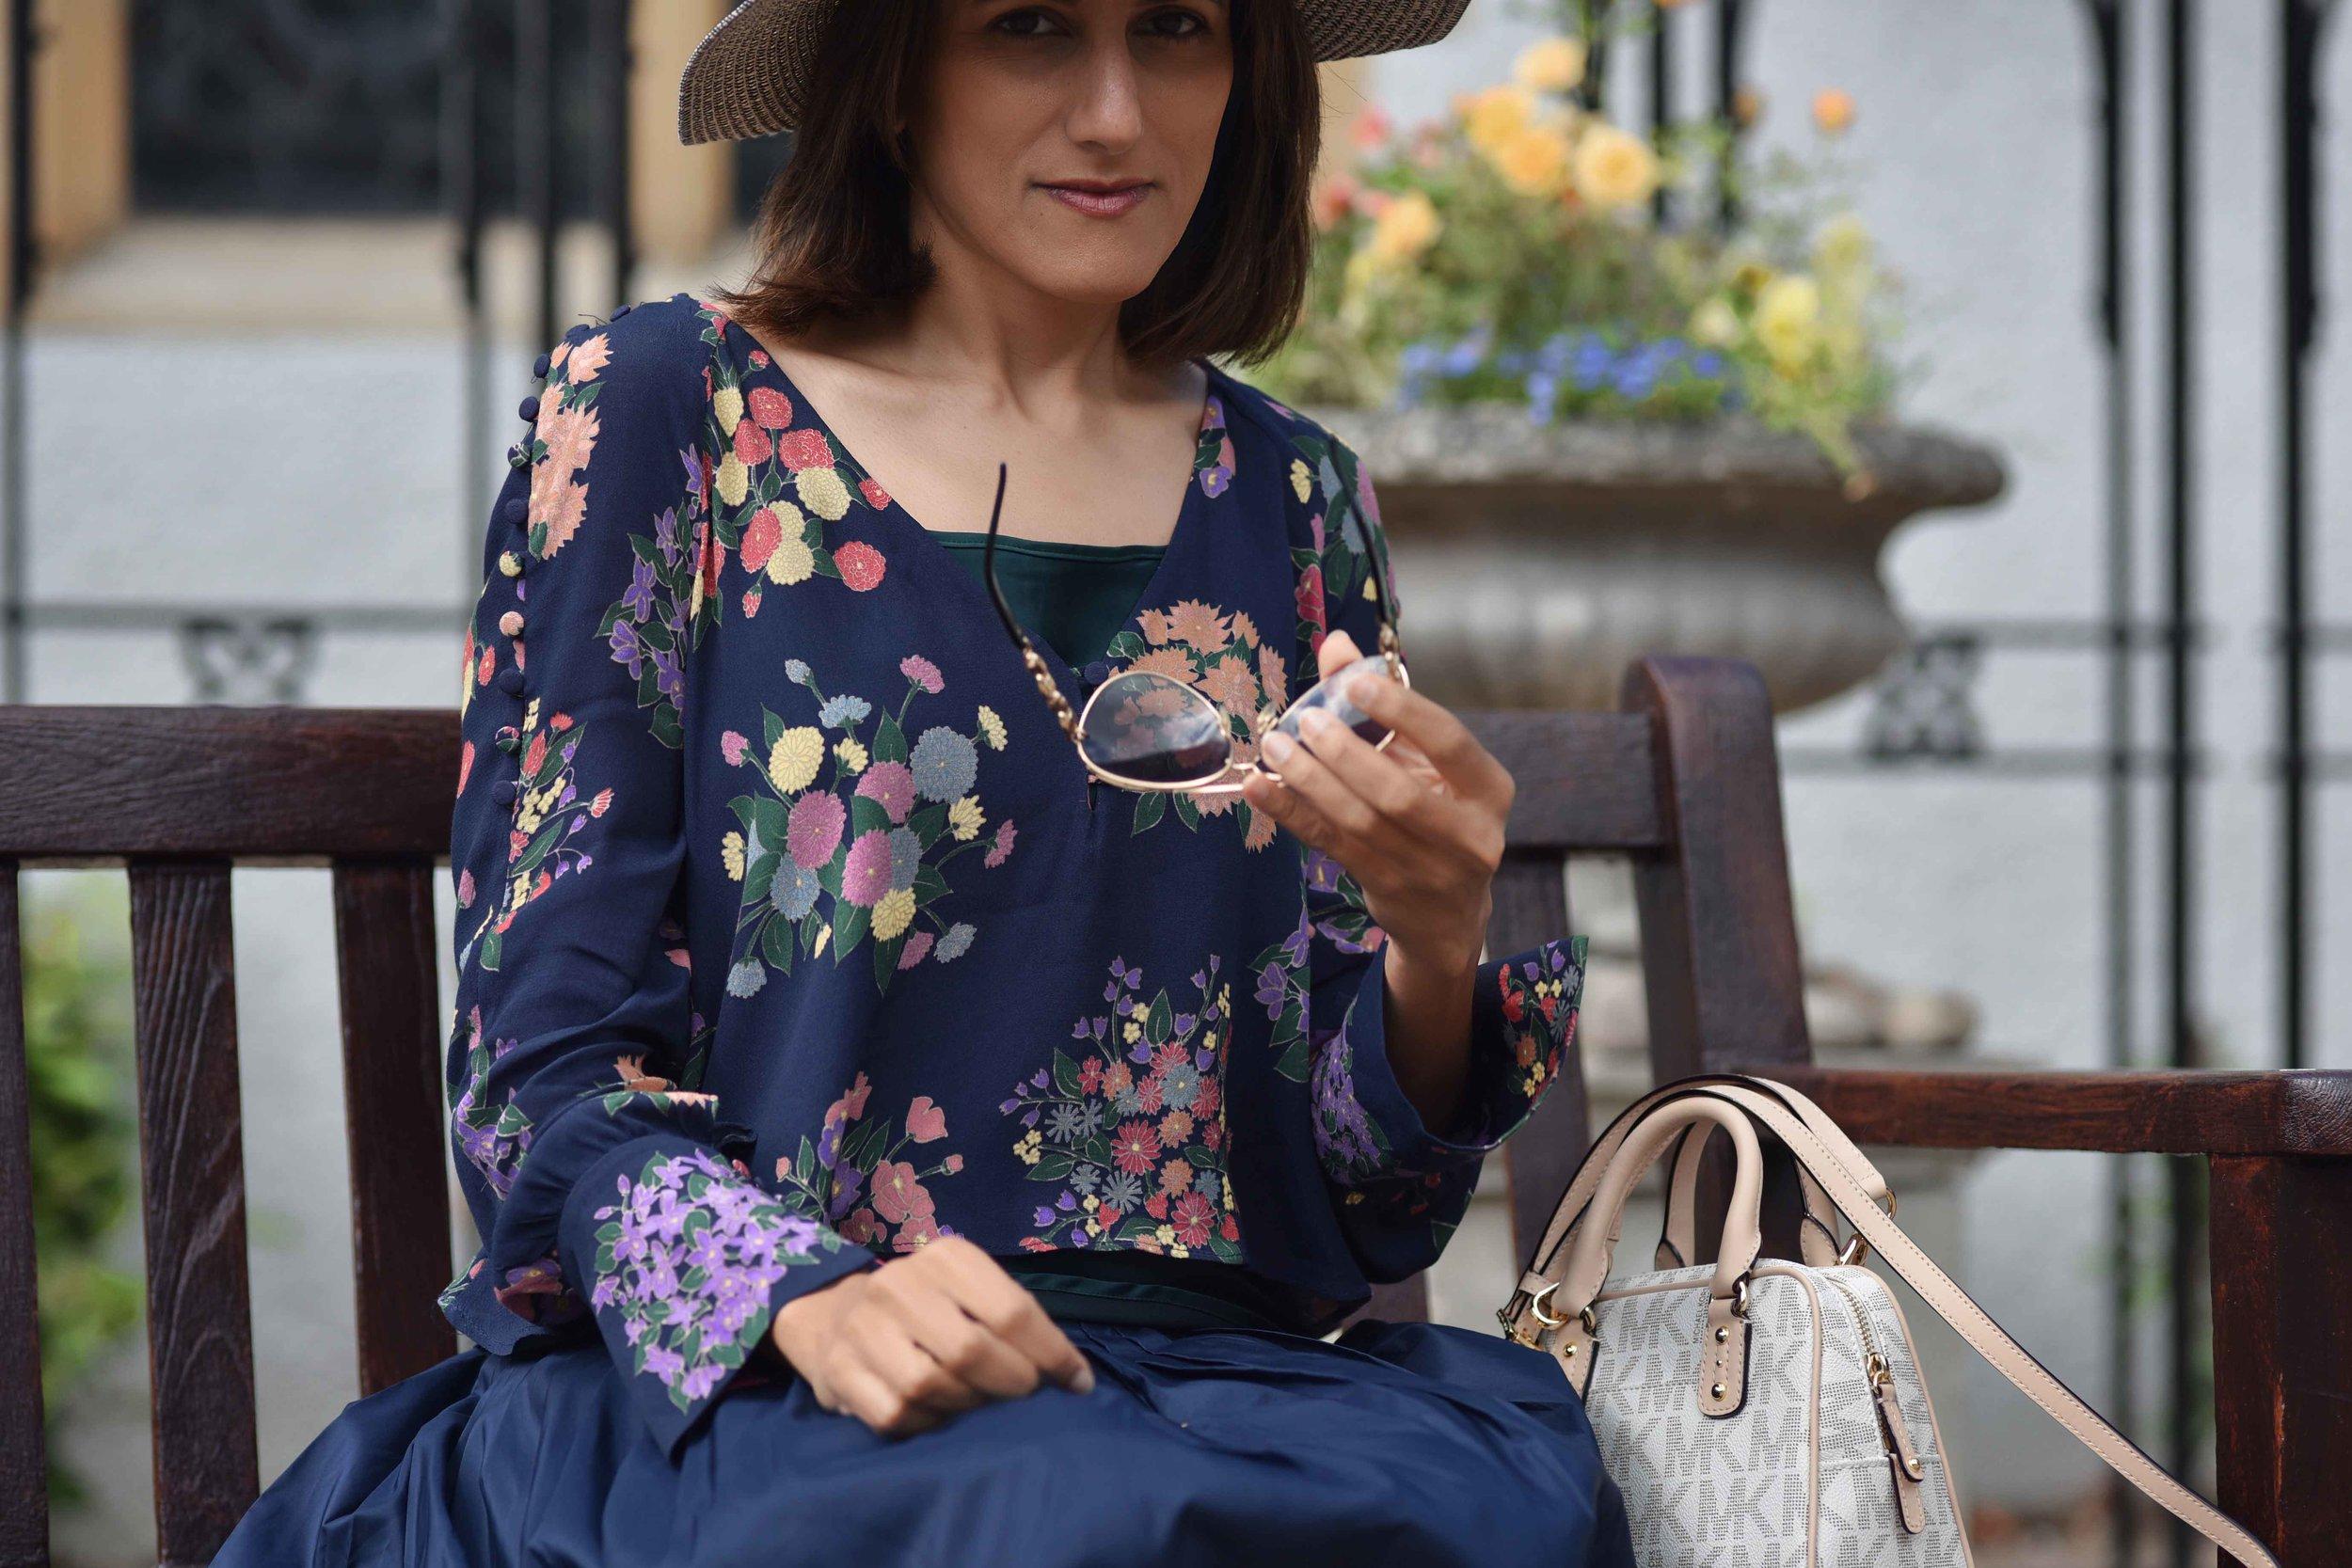 Zara floral top, Talbots silk Taffeta skirt, Talbots silk camisole, Michael Kors bag, M&S hat. Image©sourcingstyle.com